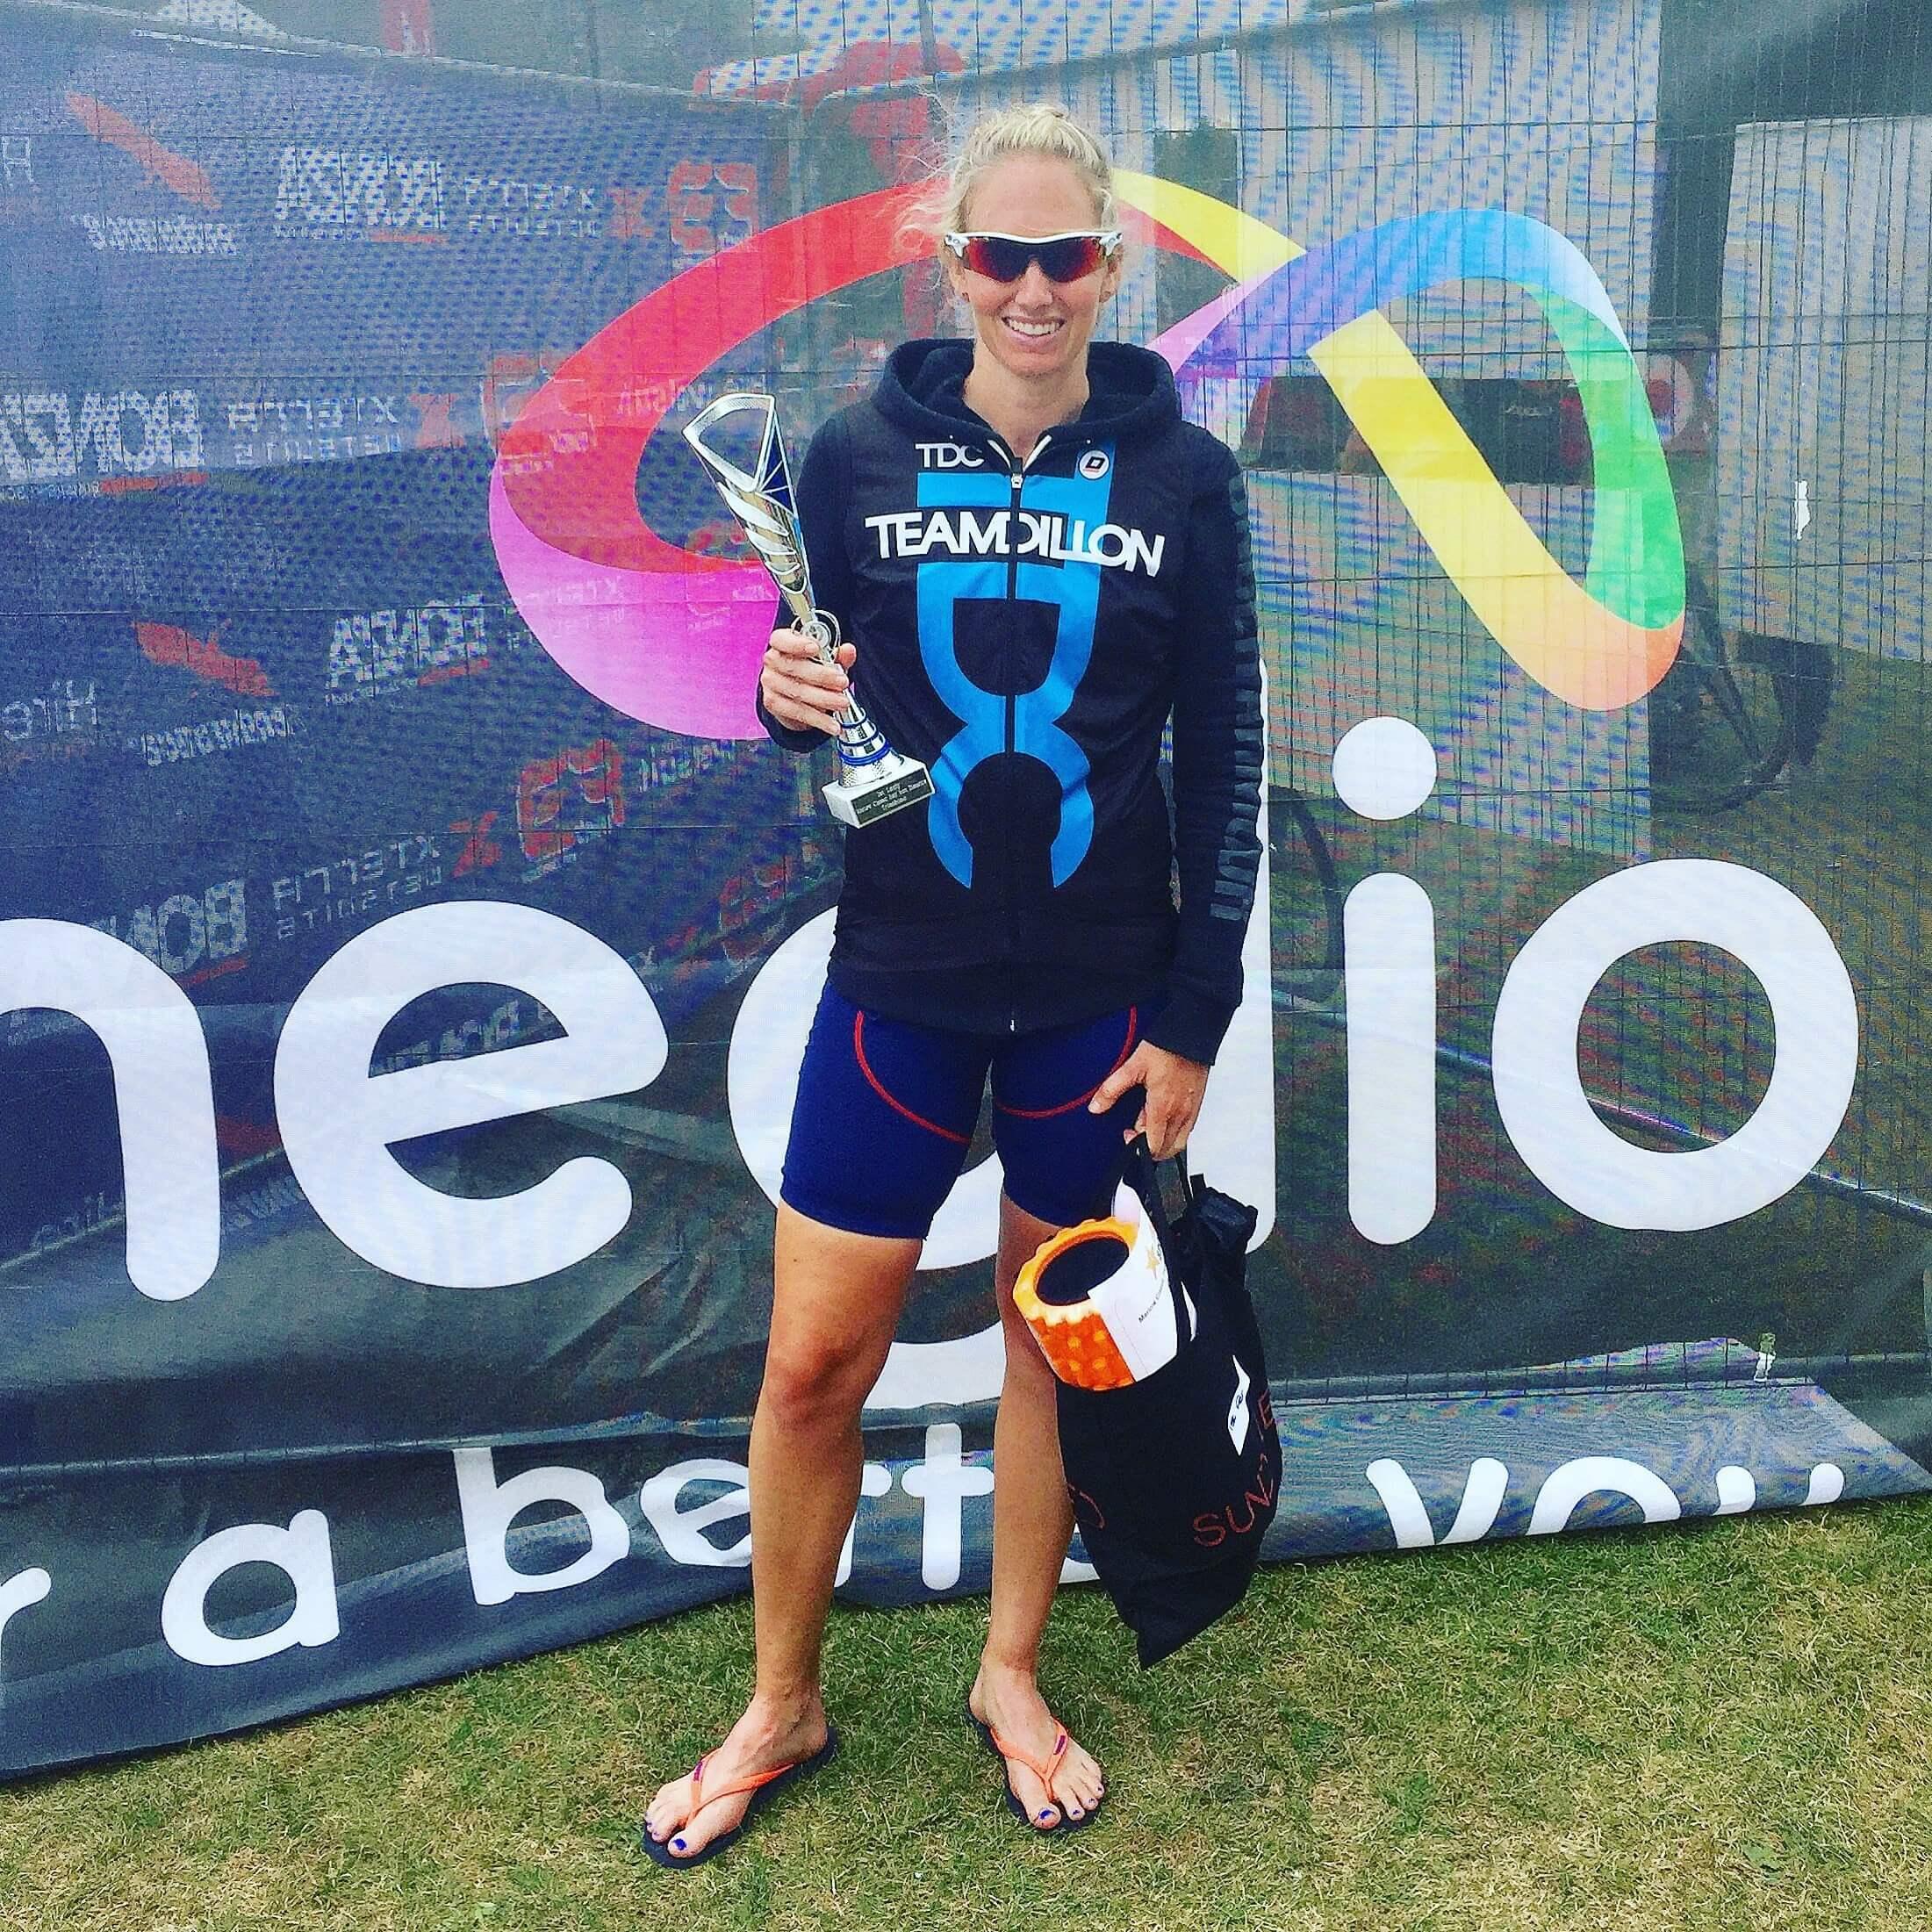 Athlete Profile - Lori Westcott